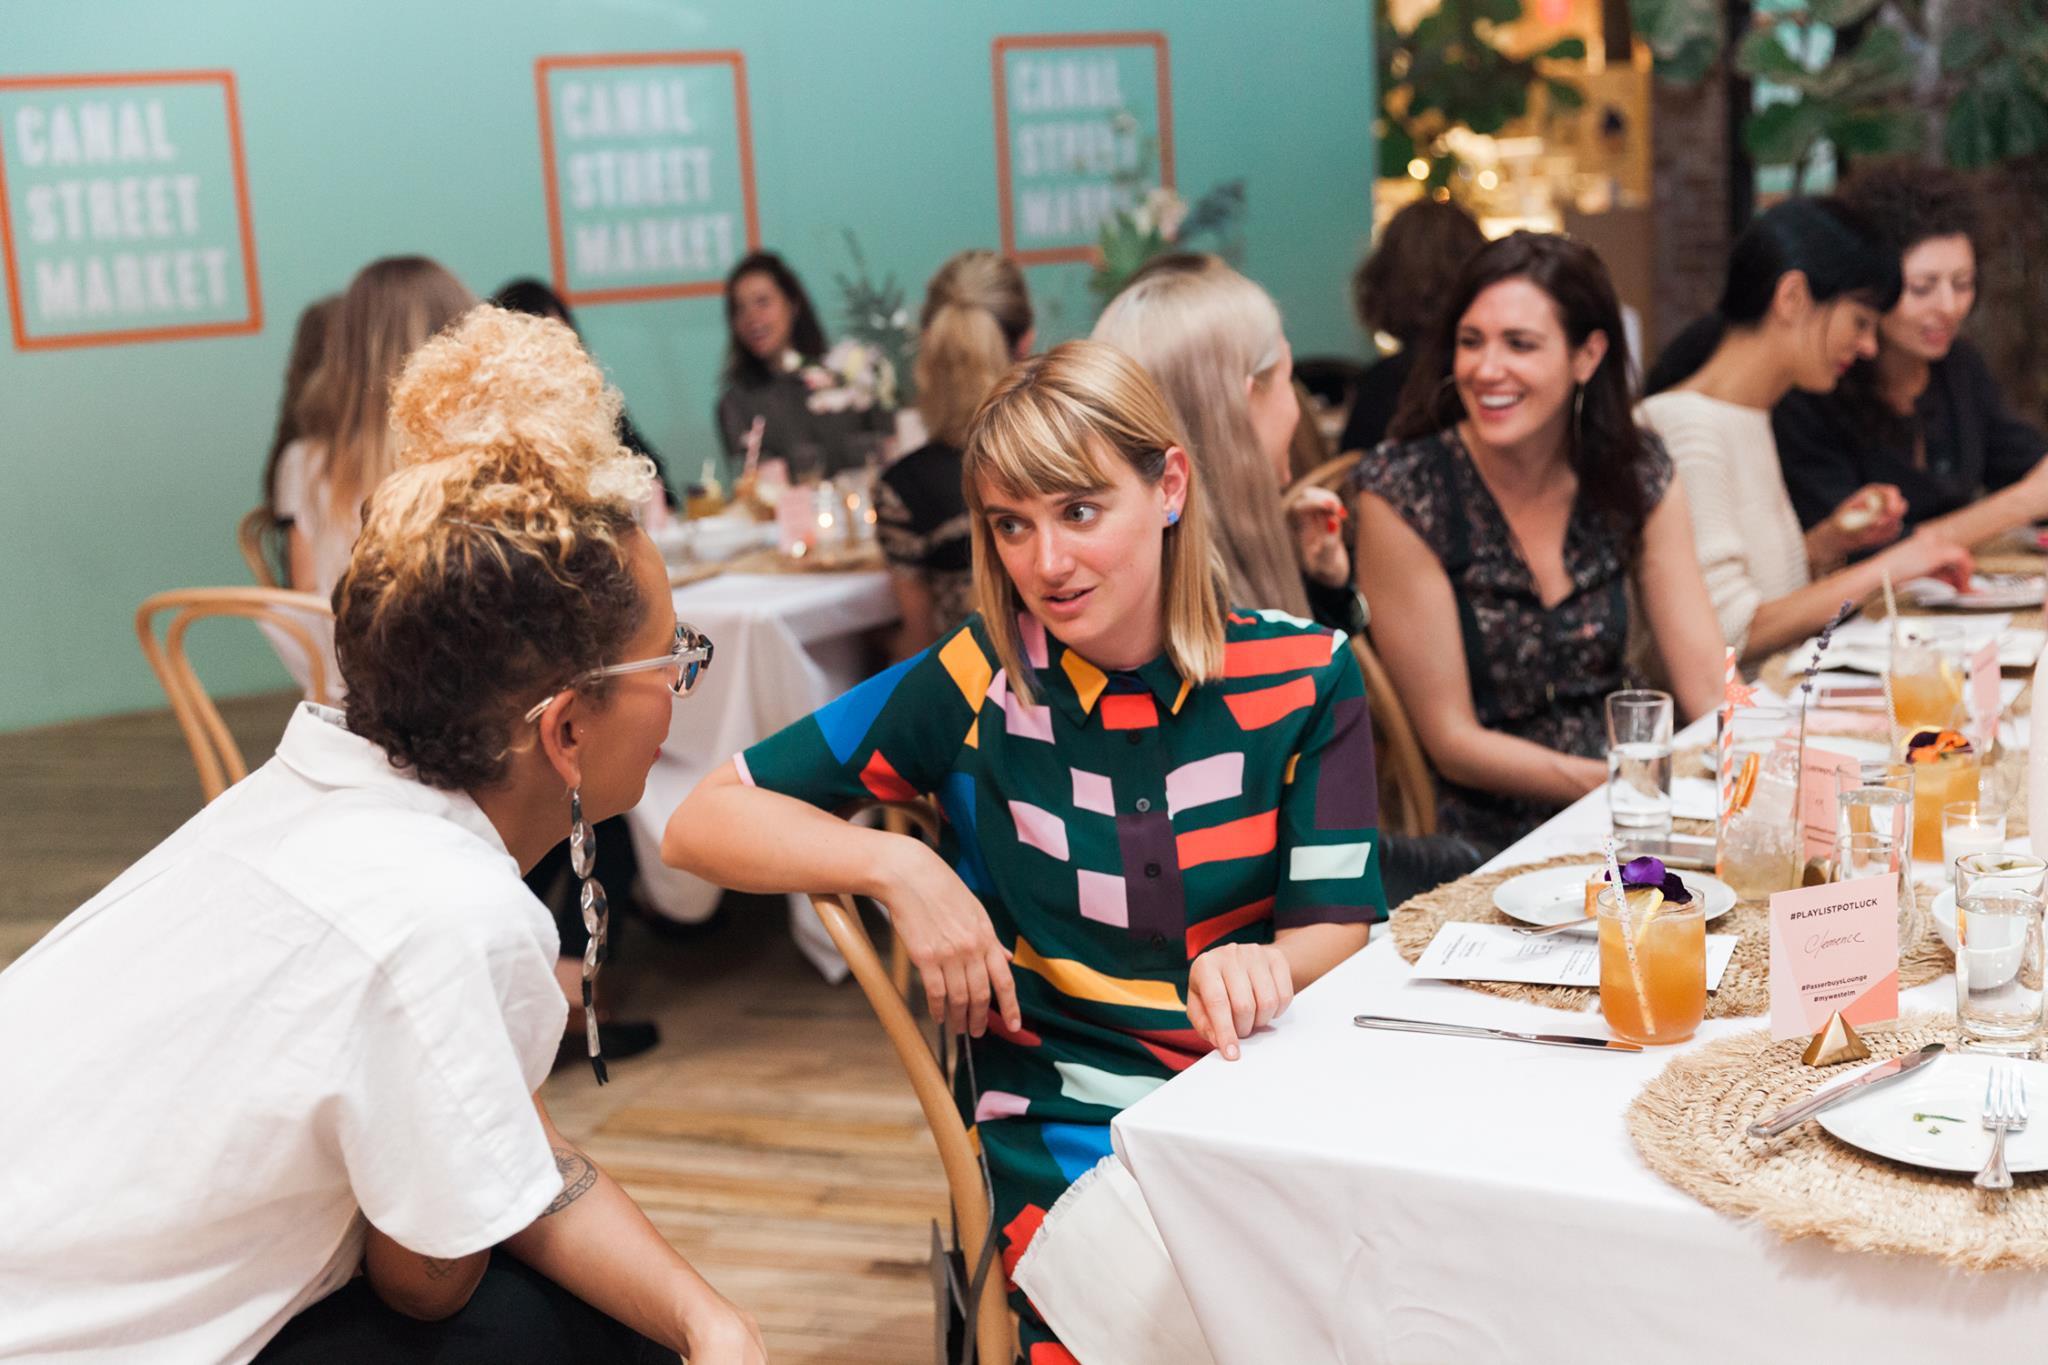 Jenna Wortham (NYT) and designer Ellen Van Dussen at Passerbuys x West Elm x Sonos Playlist Potluck Private Dinner